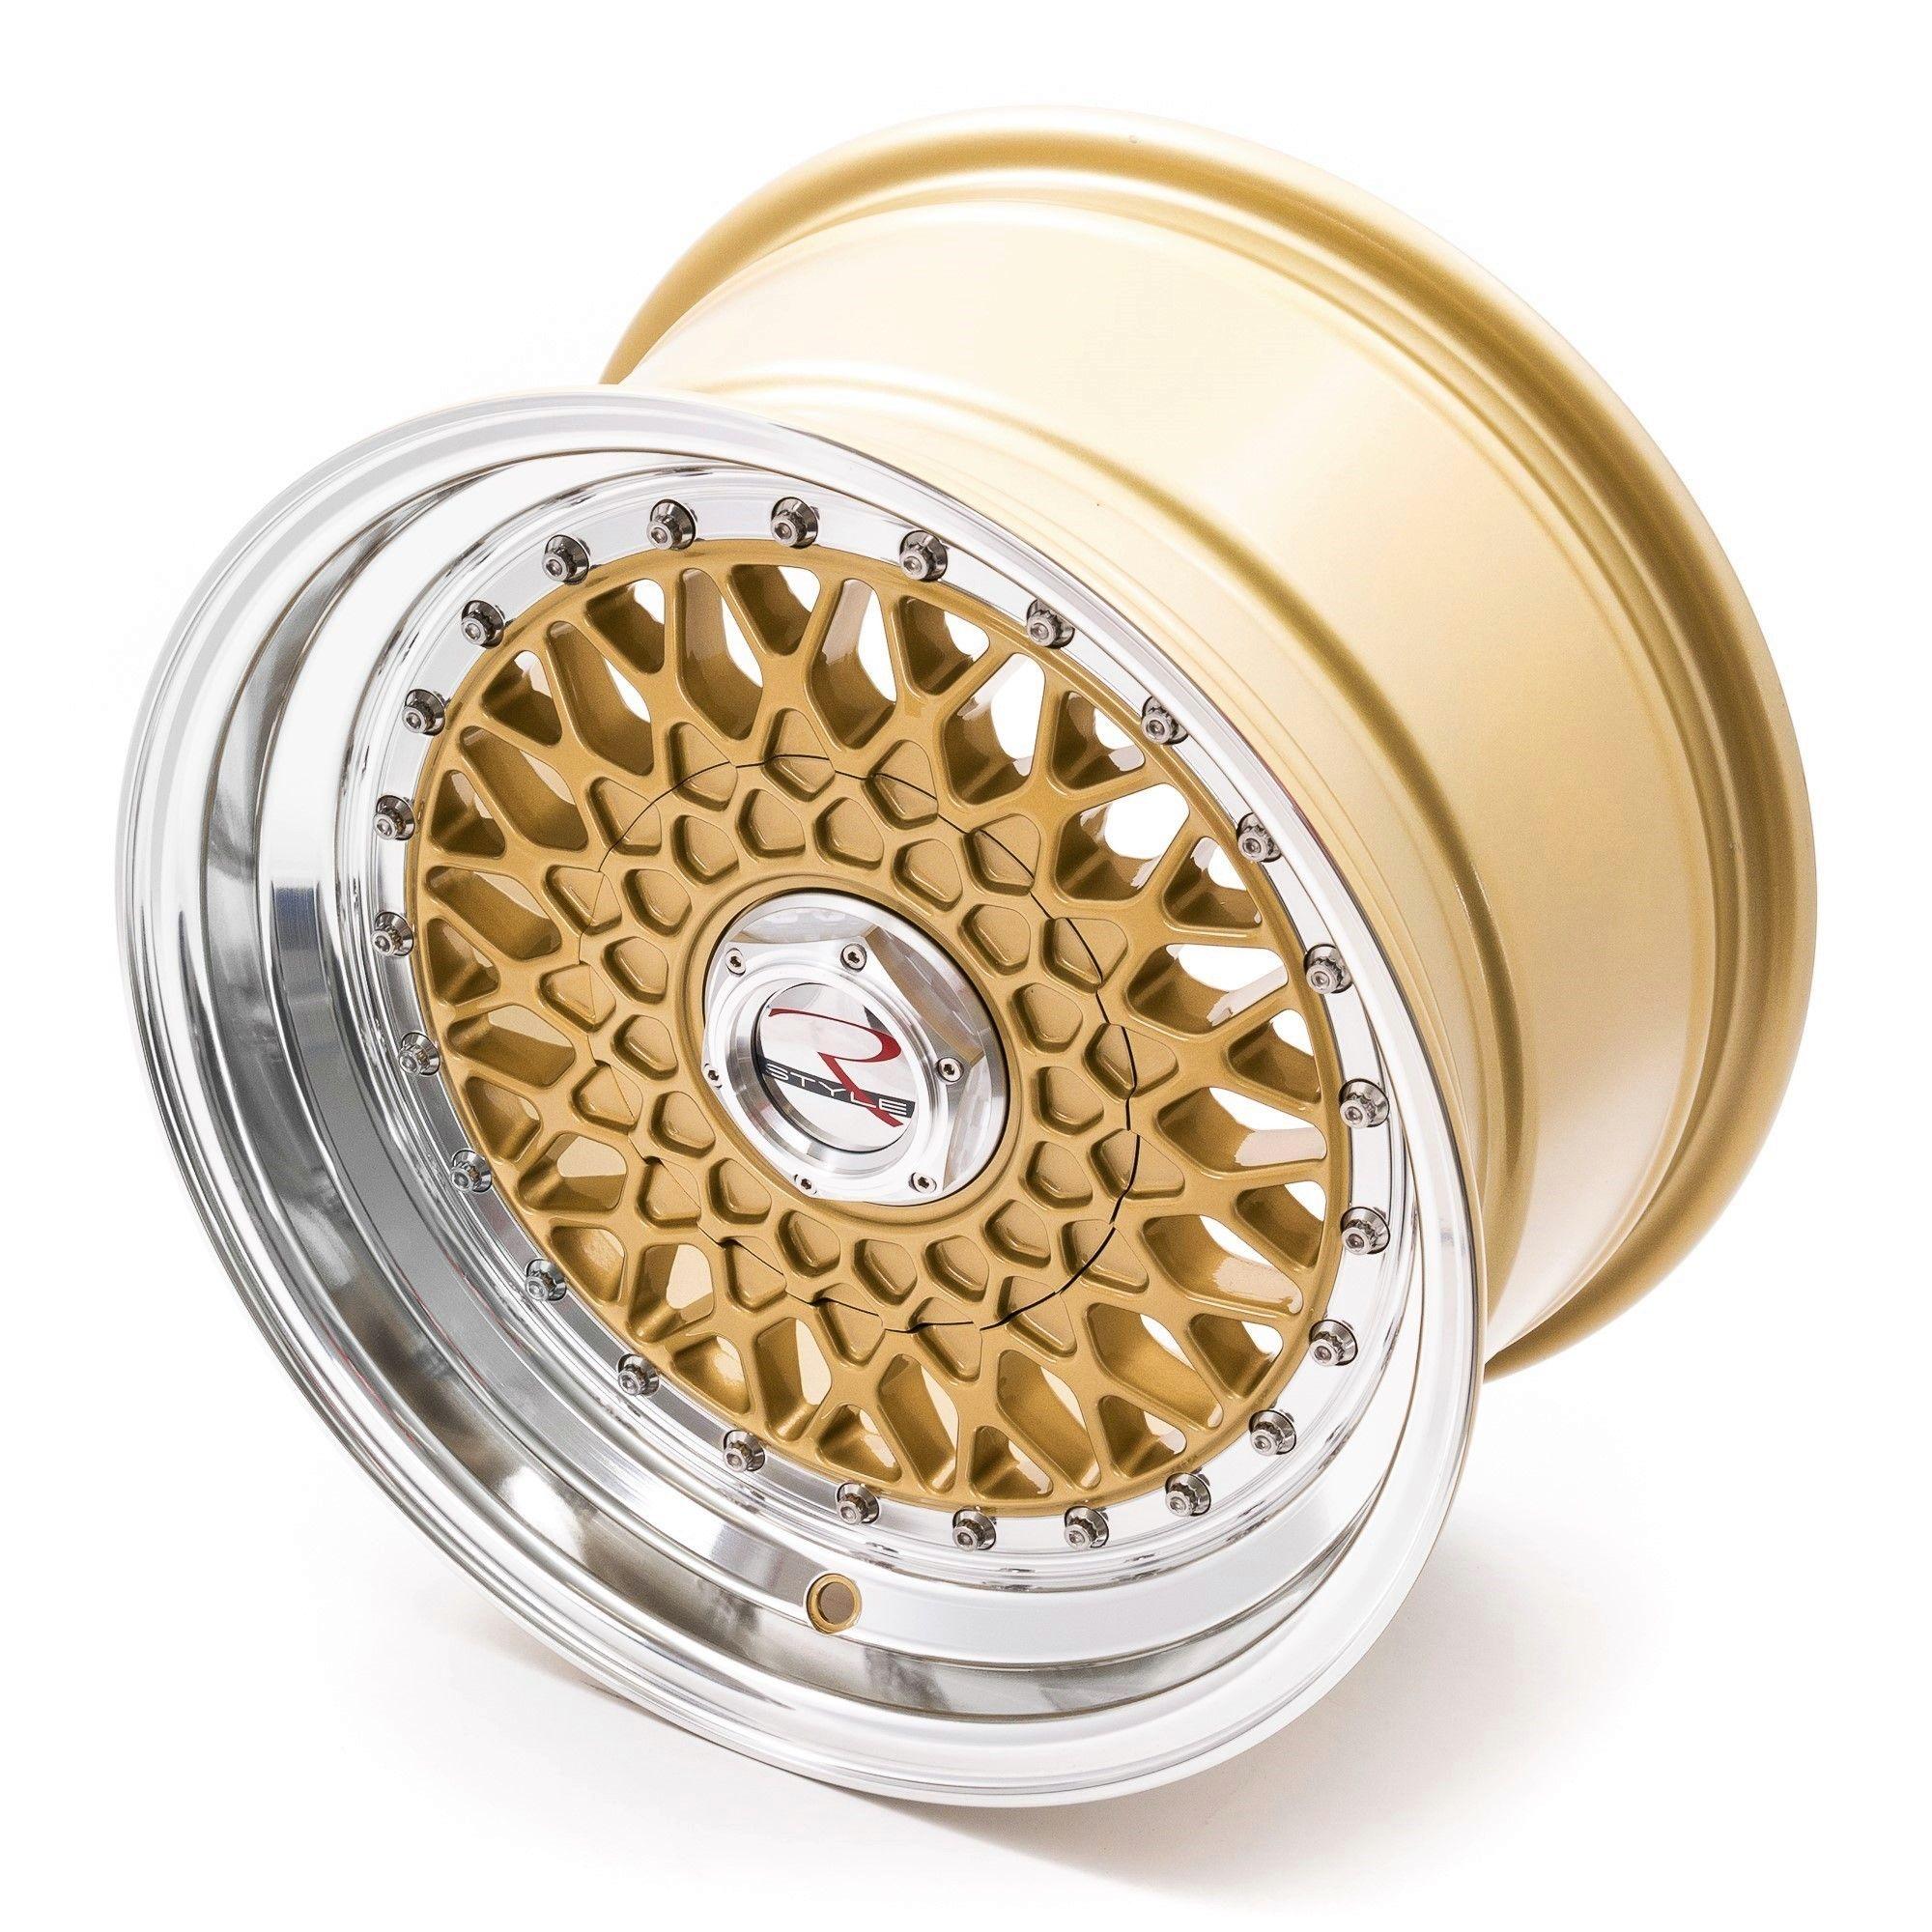 rstyle wheels rs01 felgen gold horn polished in 16 zoll. Black Bedroom Furniture Sets. Home Design Ideas